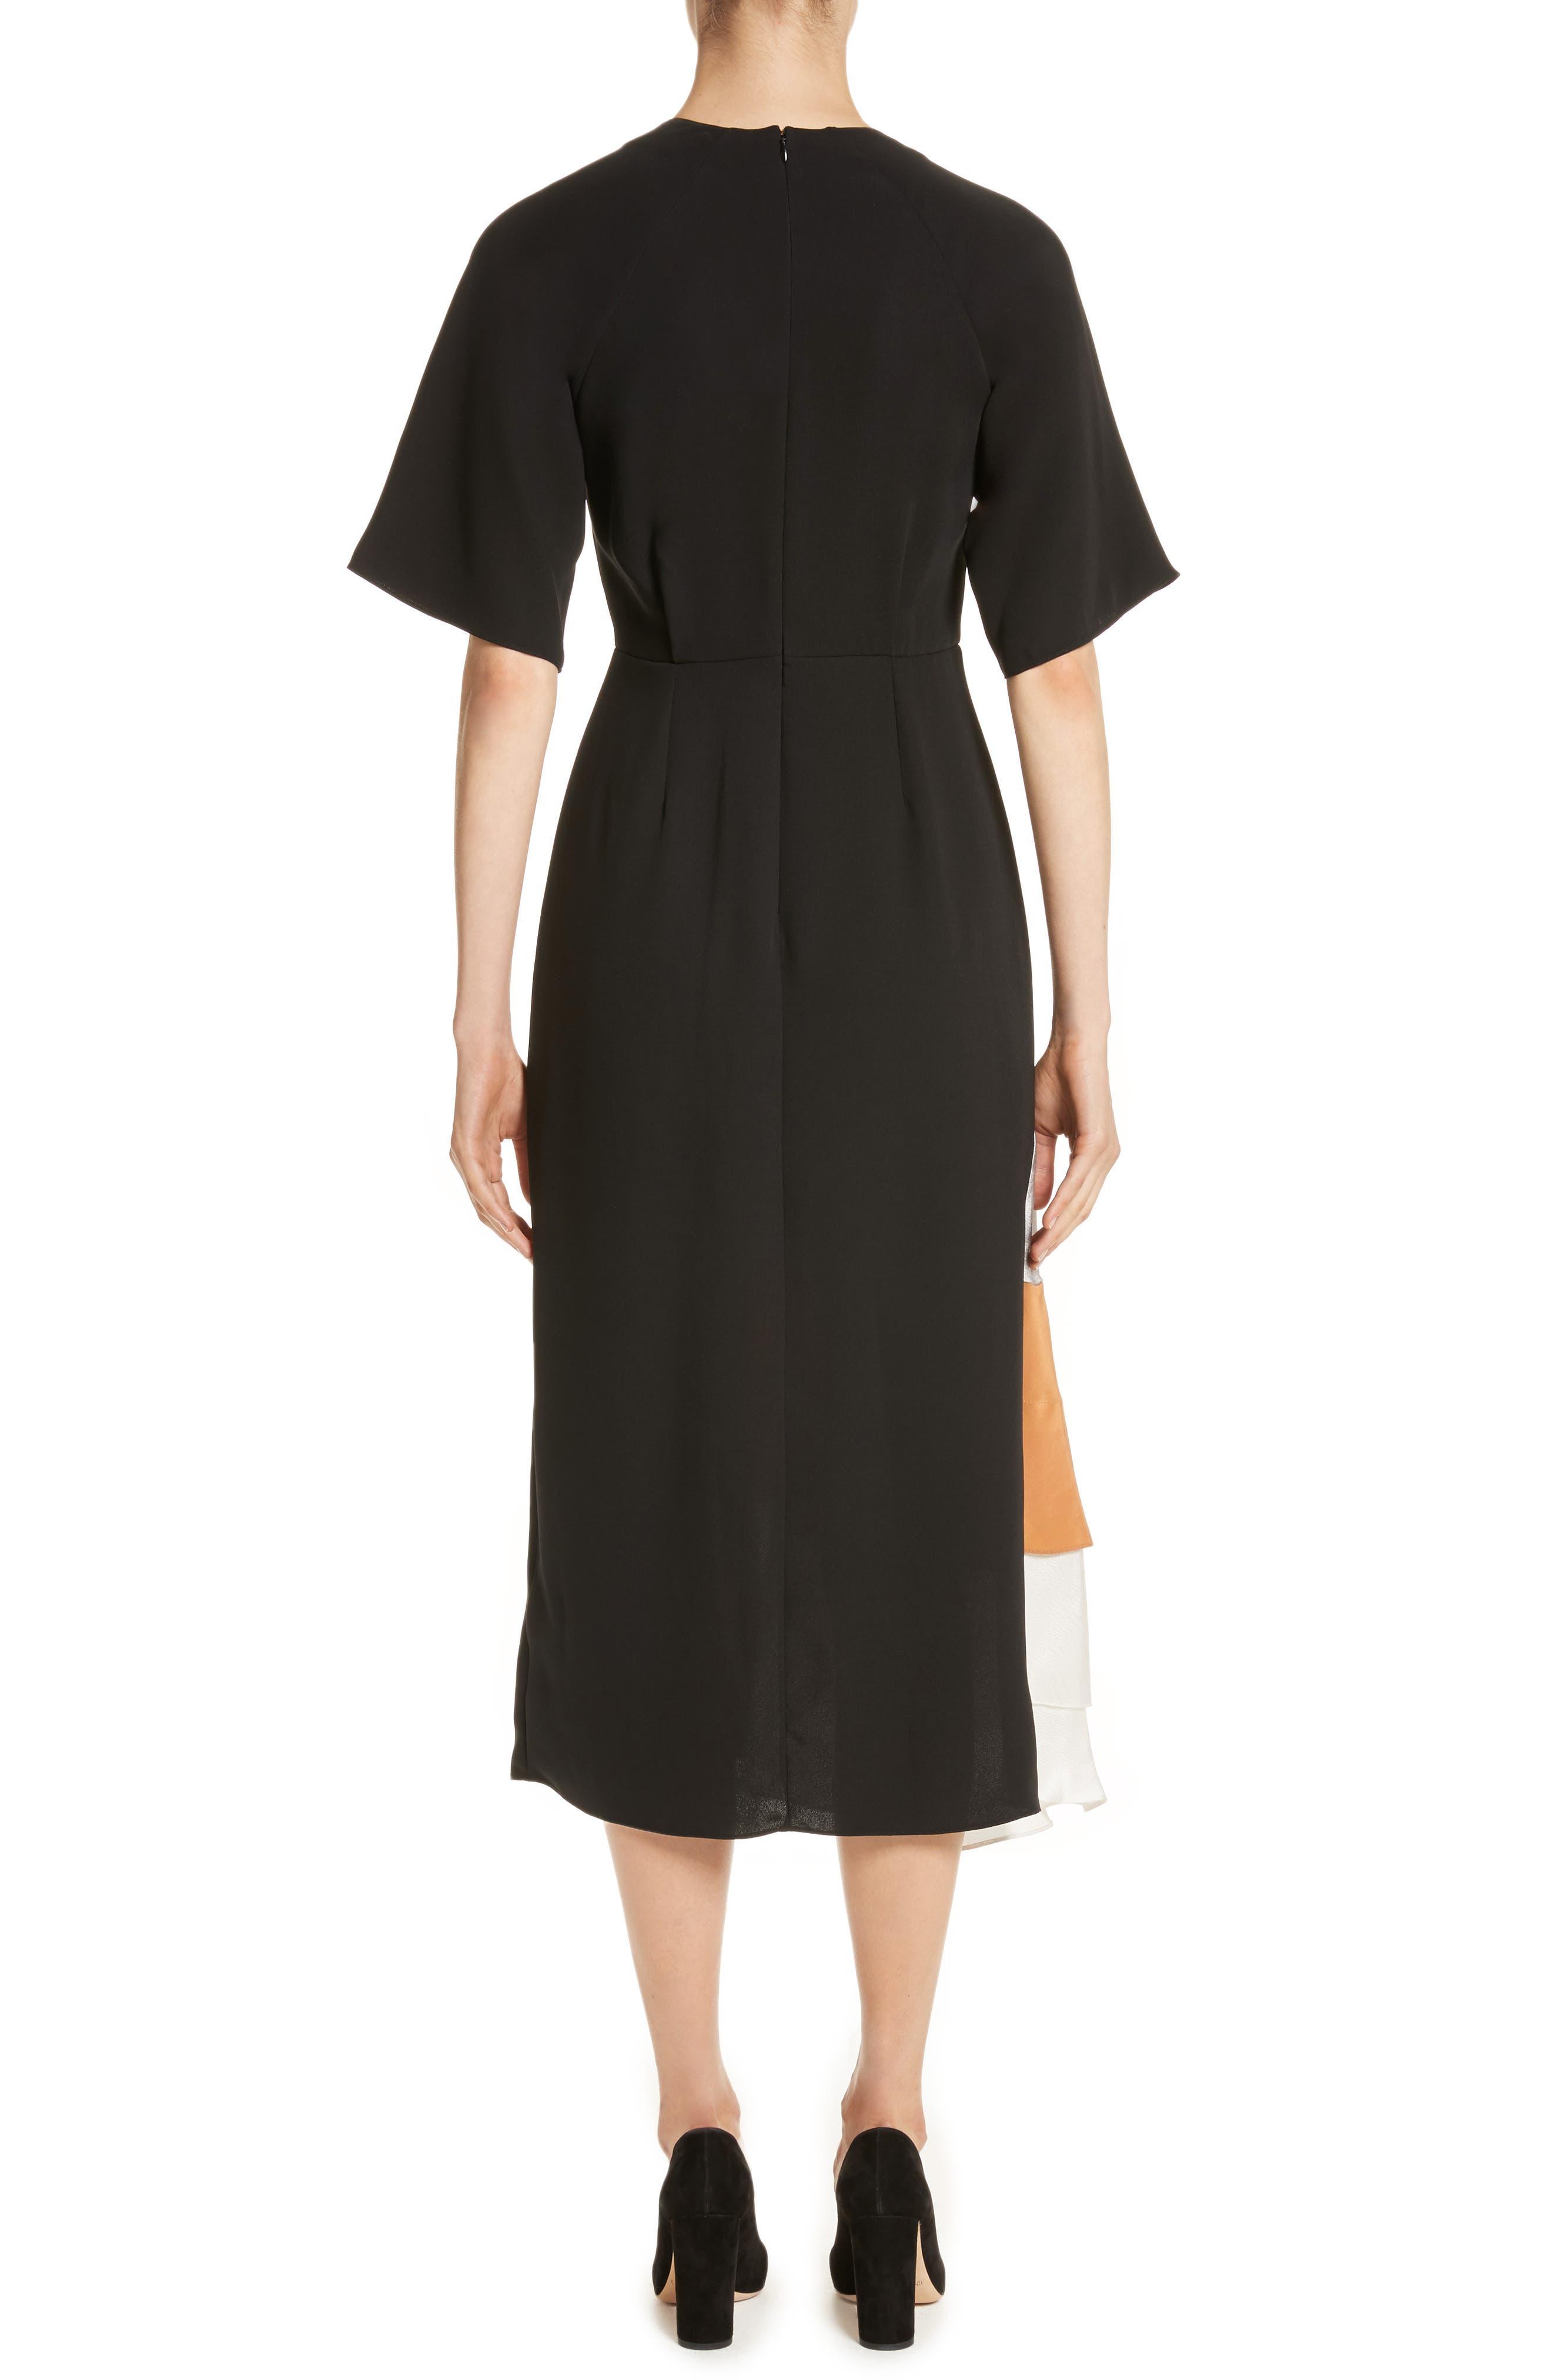 Rauma Silk Dress,                             Alternate thumbnail 2, color,                             Black/ Silver/ Sand/ Ivory